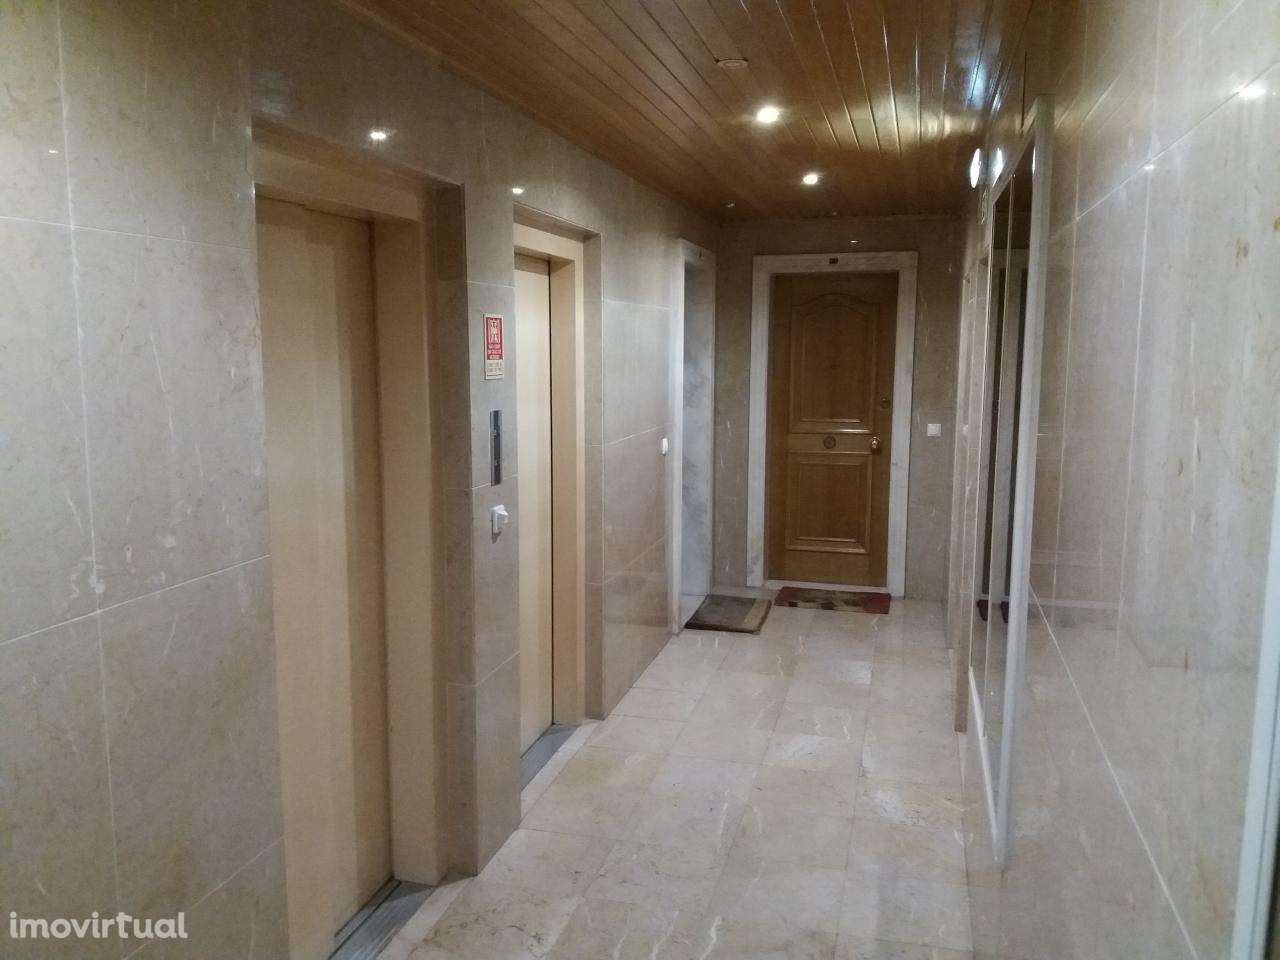 Apartamento para comprar, Areeiro, Lisboa - Foto 30